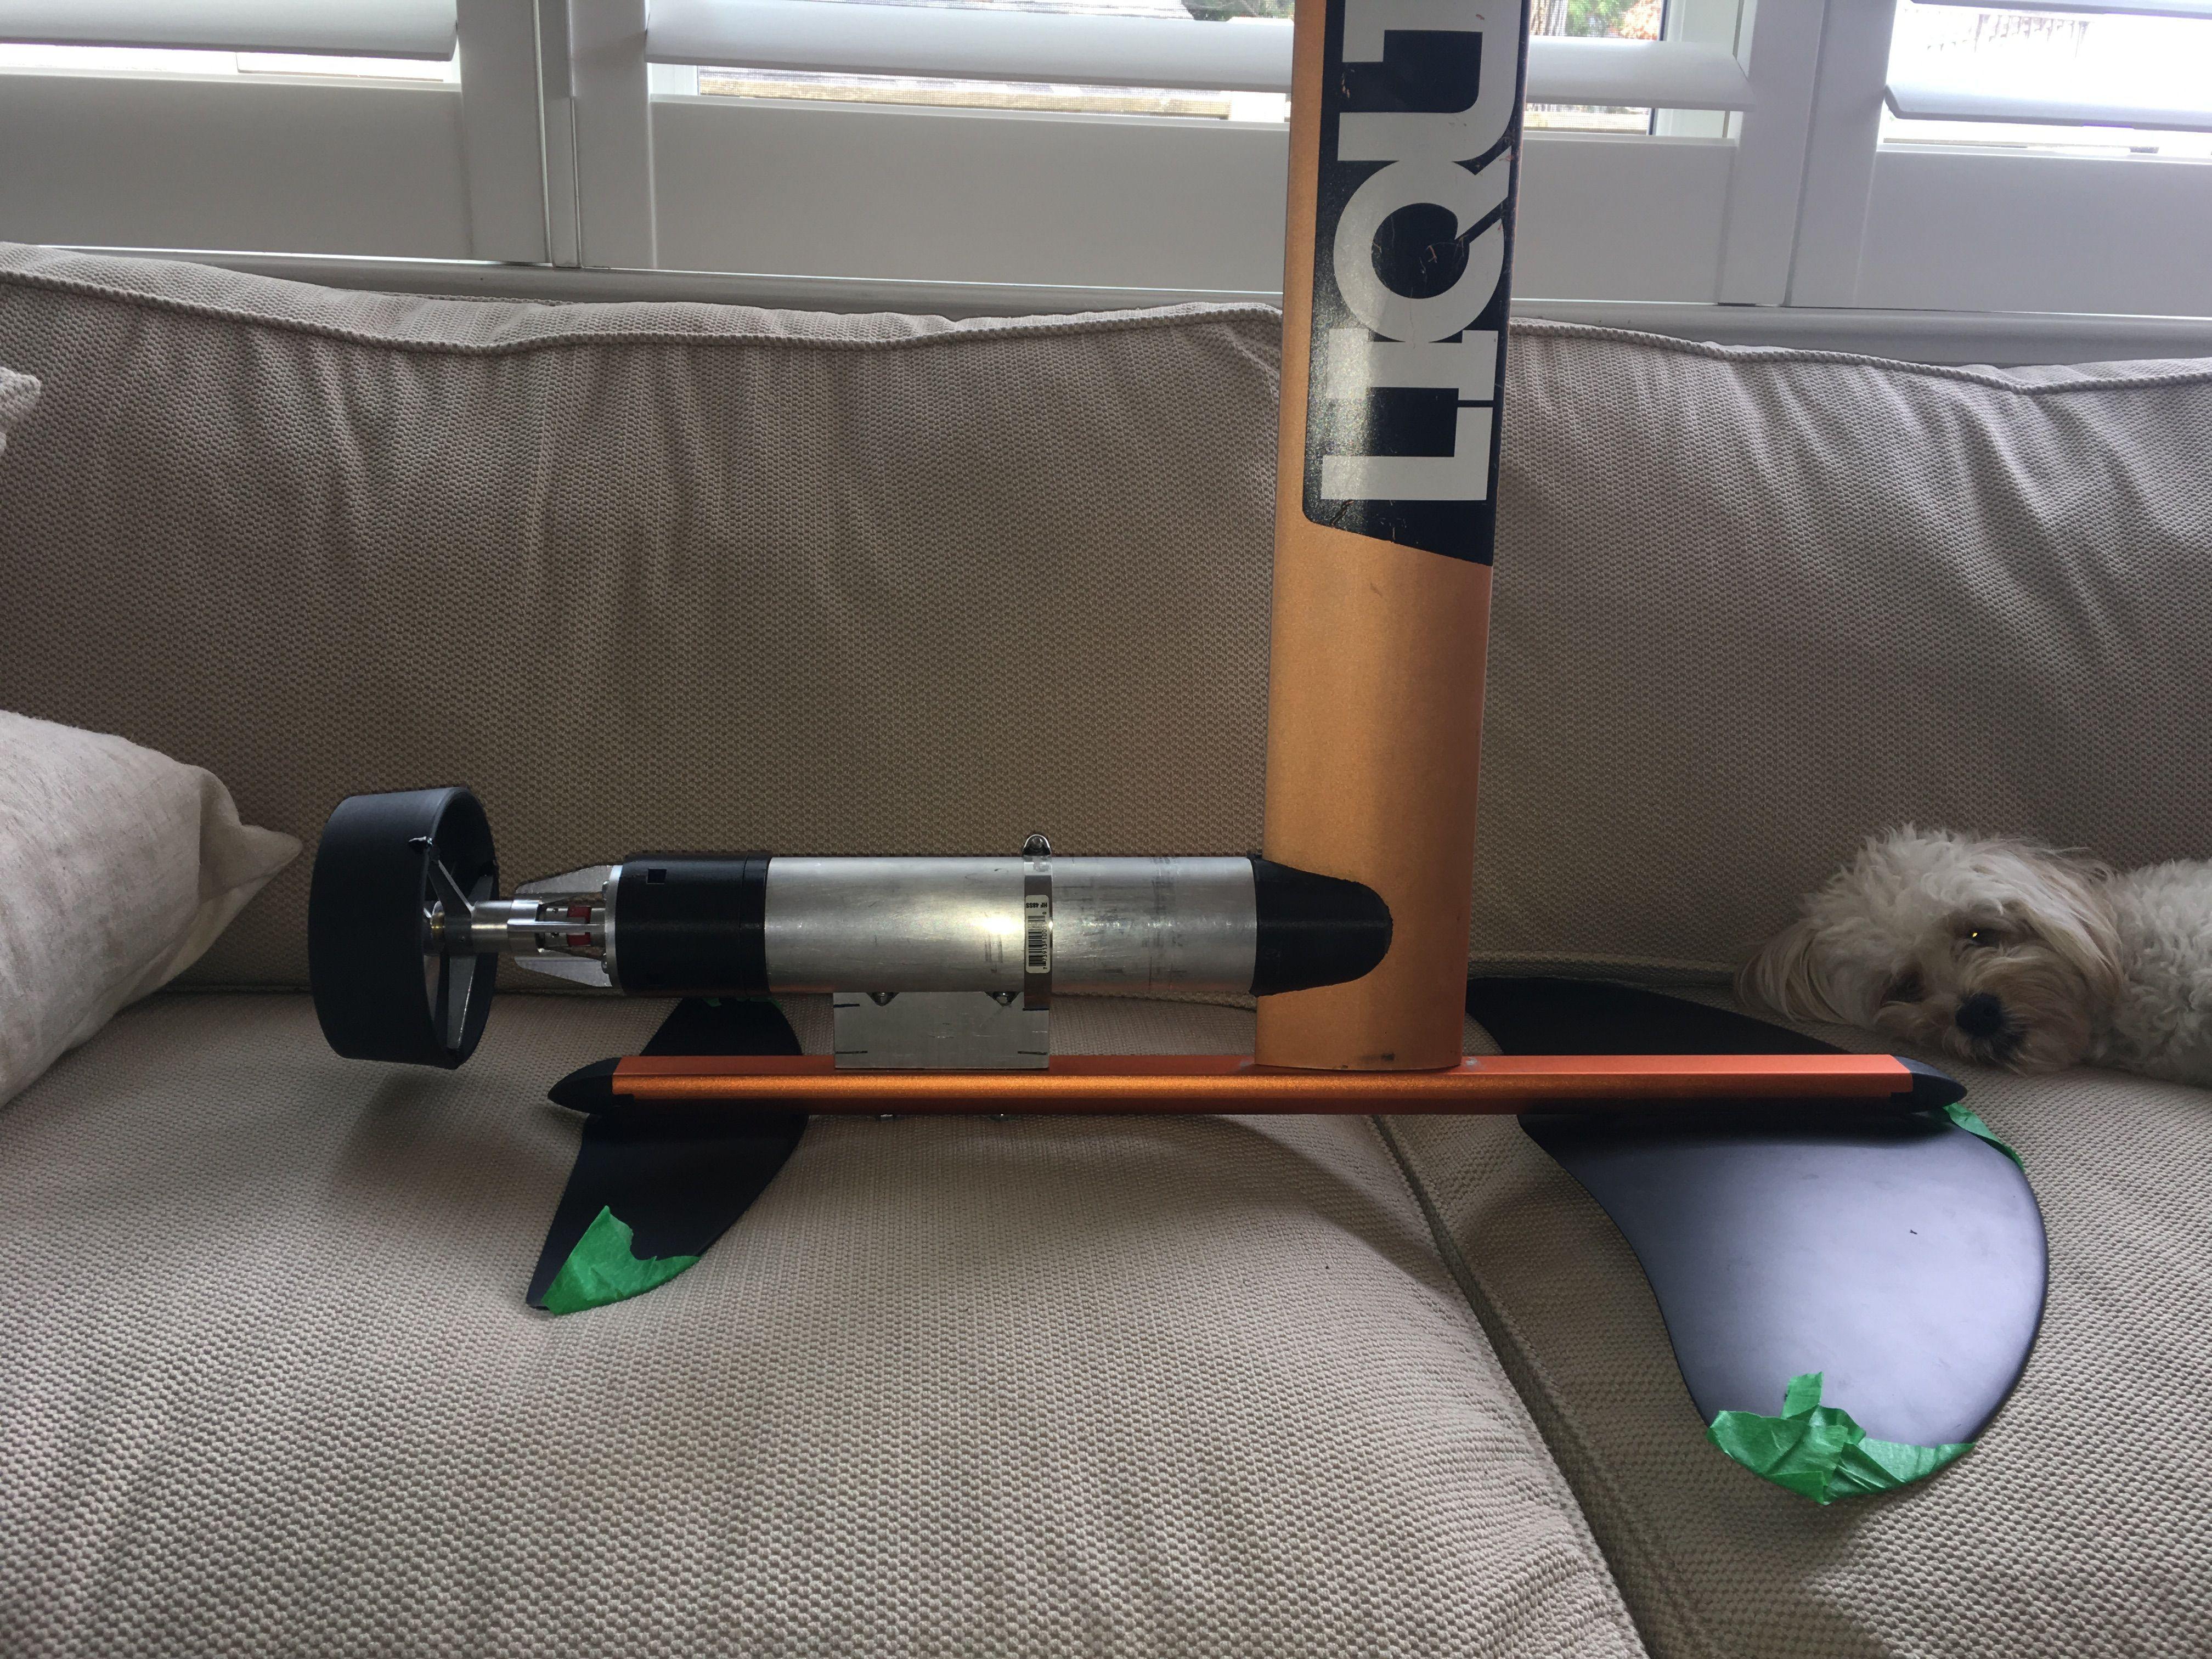 DIY Electric Hydrofoil Board Design DIYsolarenergy